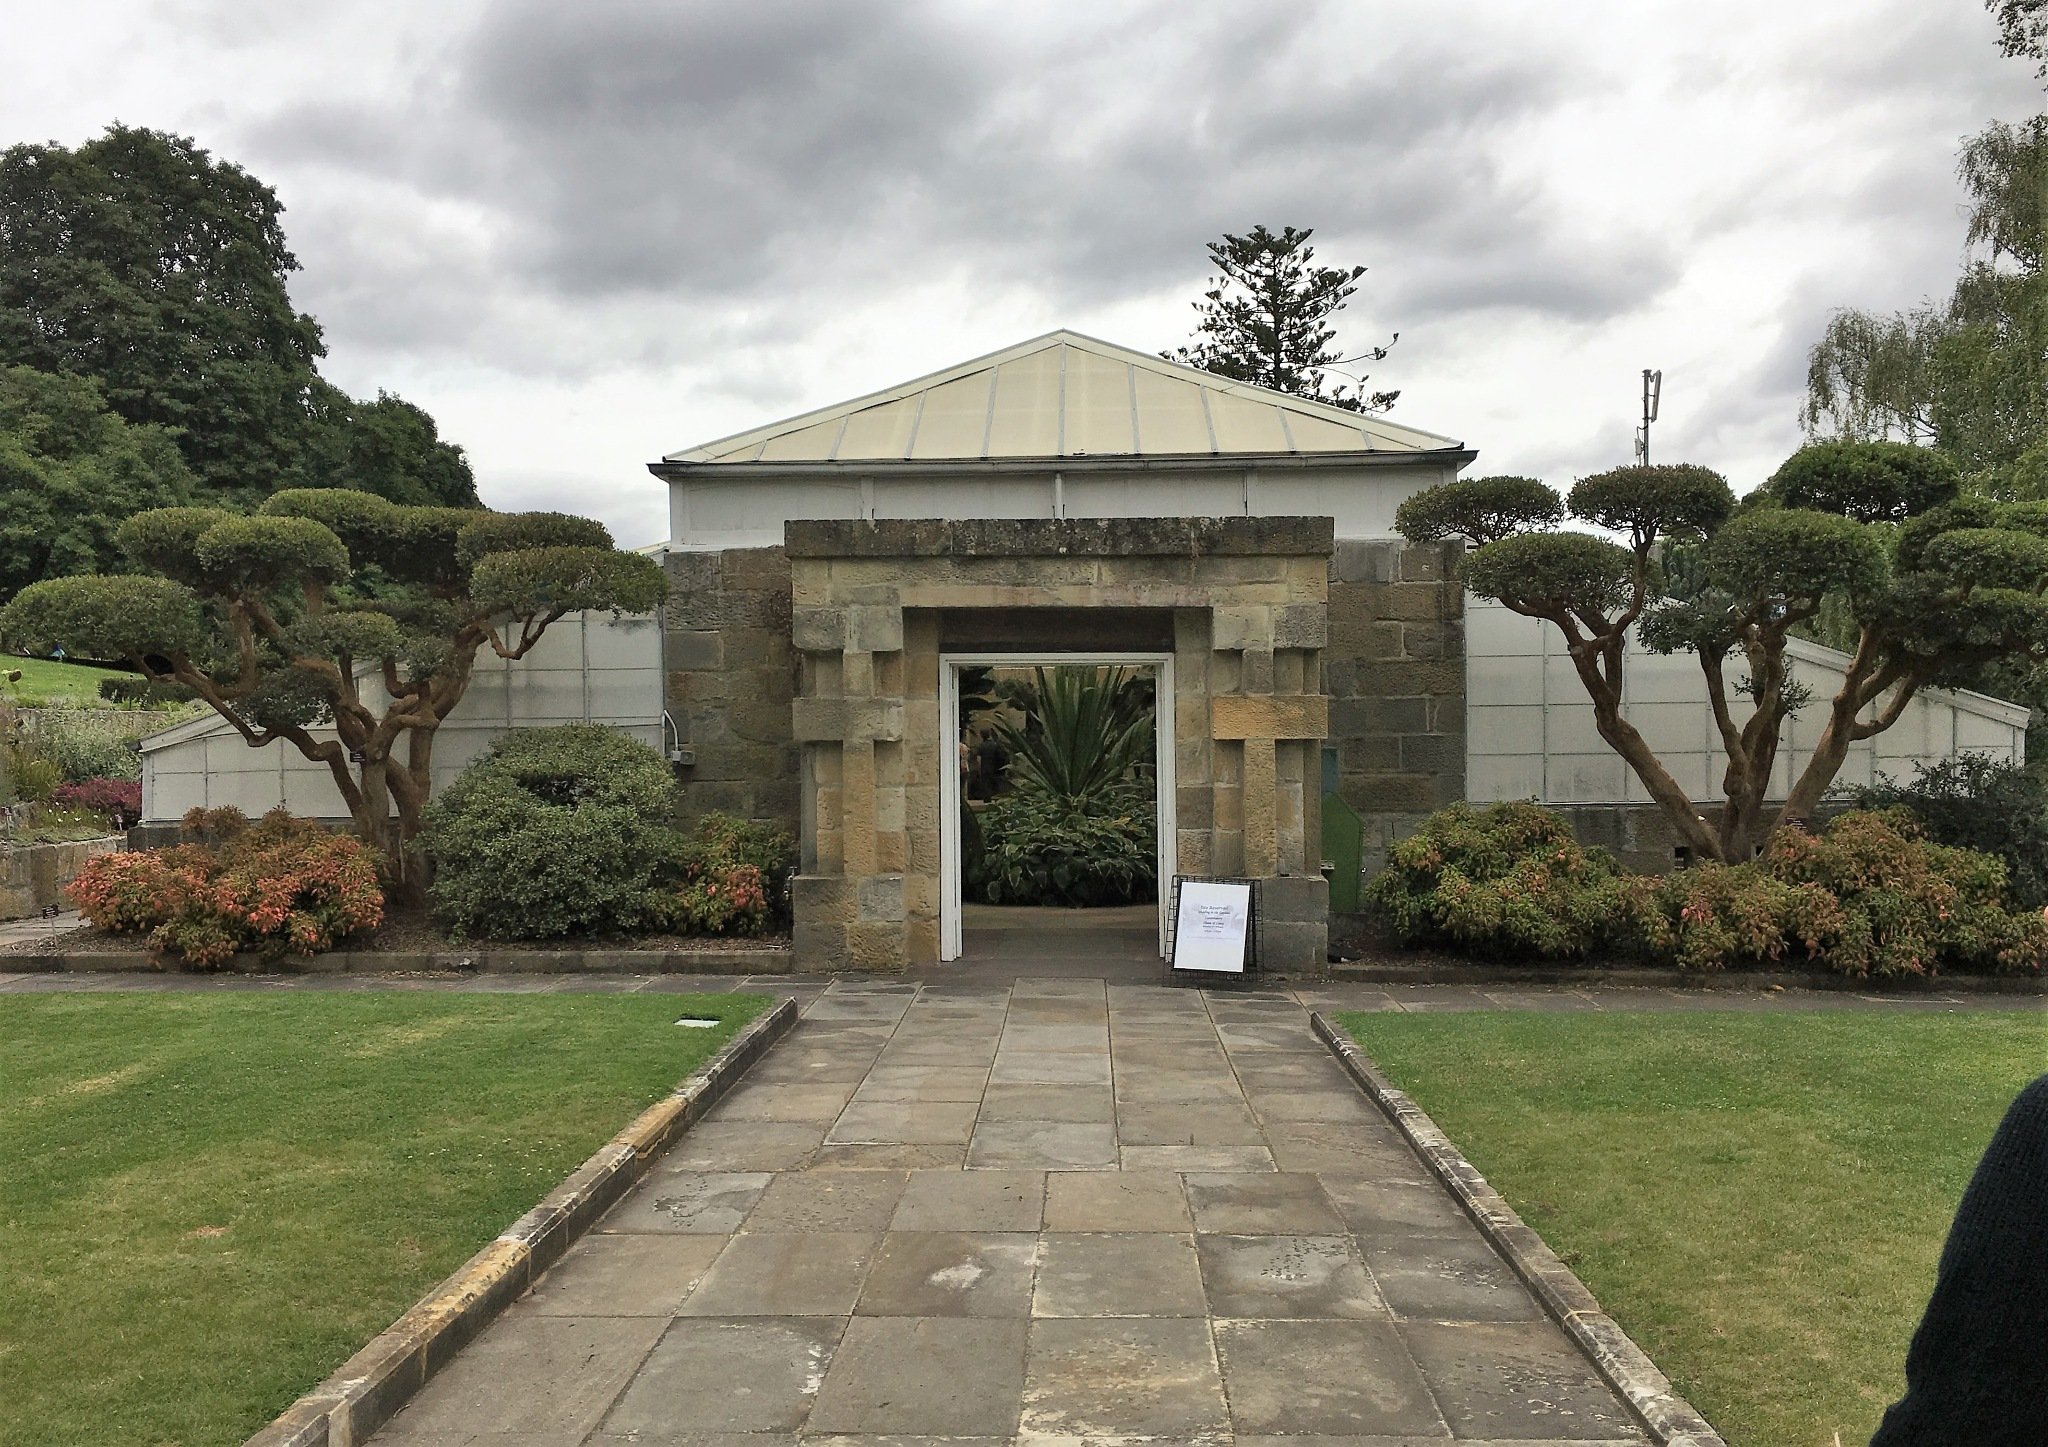 Royal Tasmanian Botanical Gardens by ronmac777